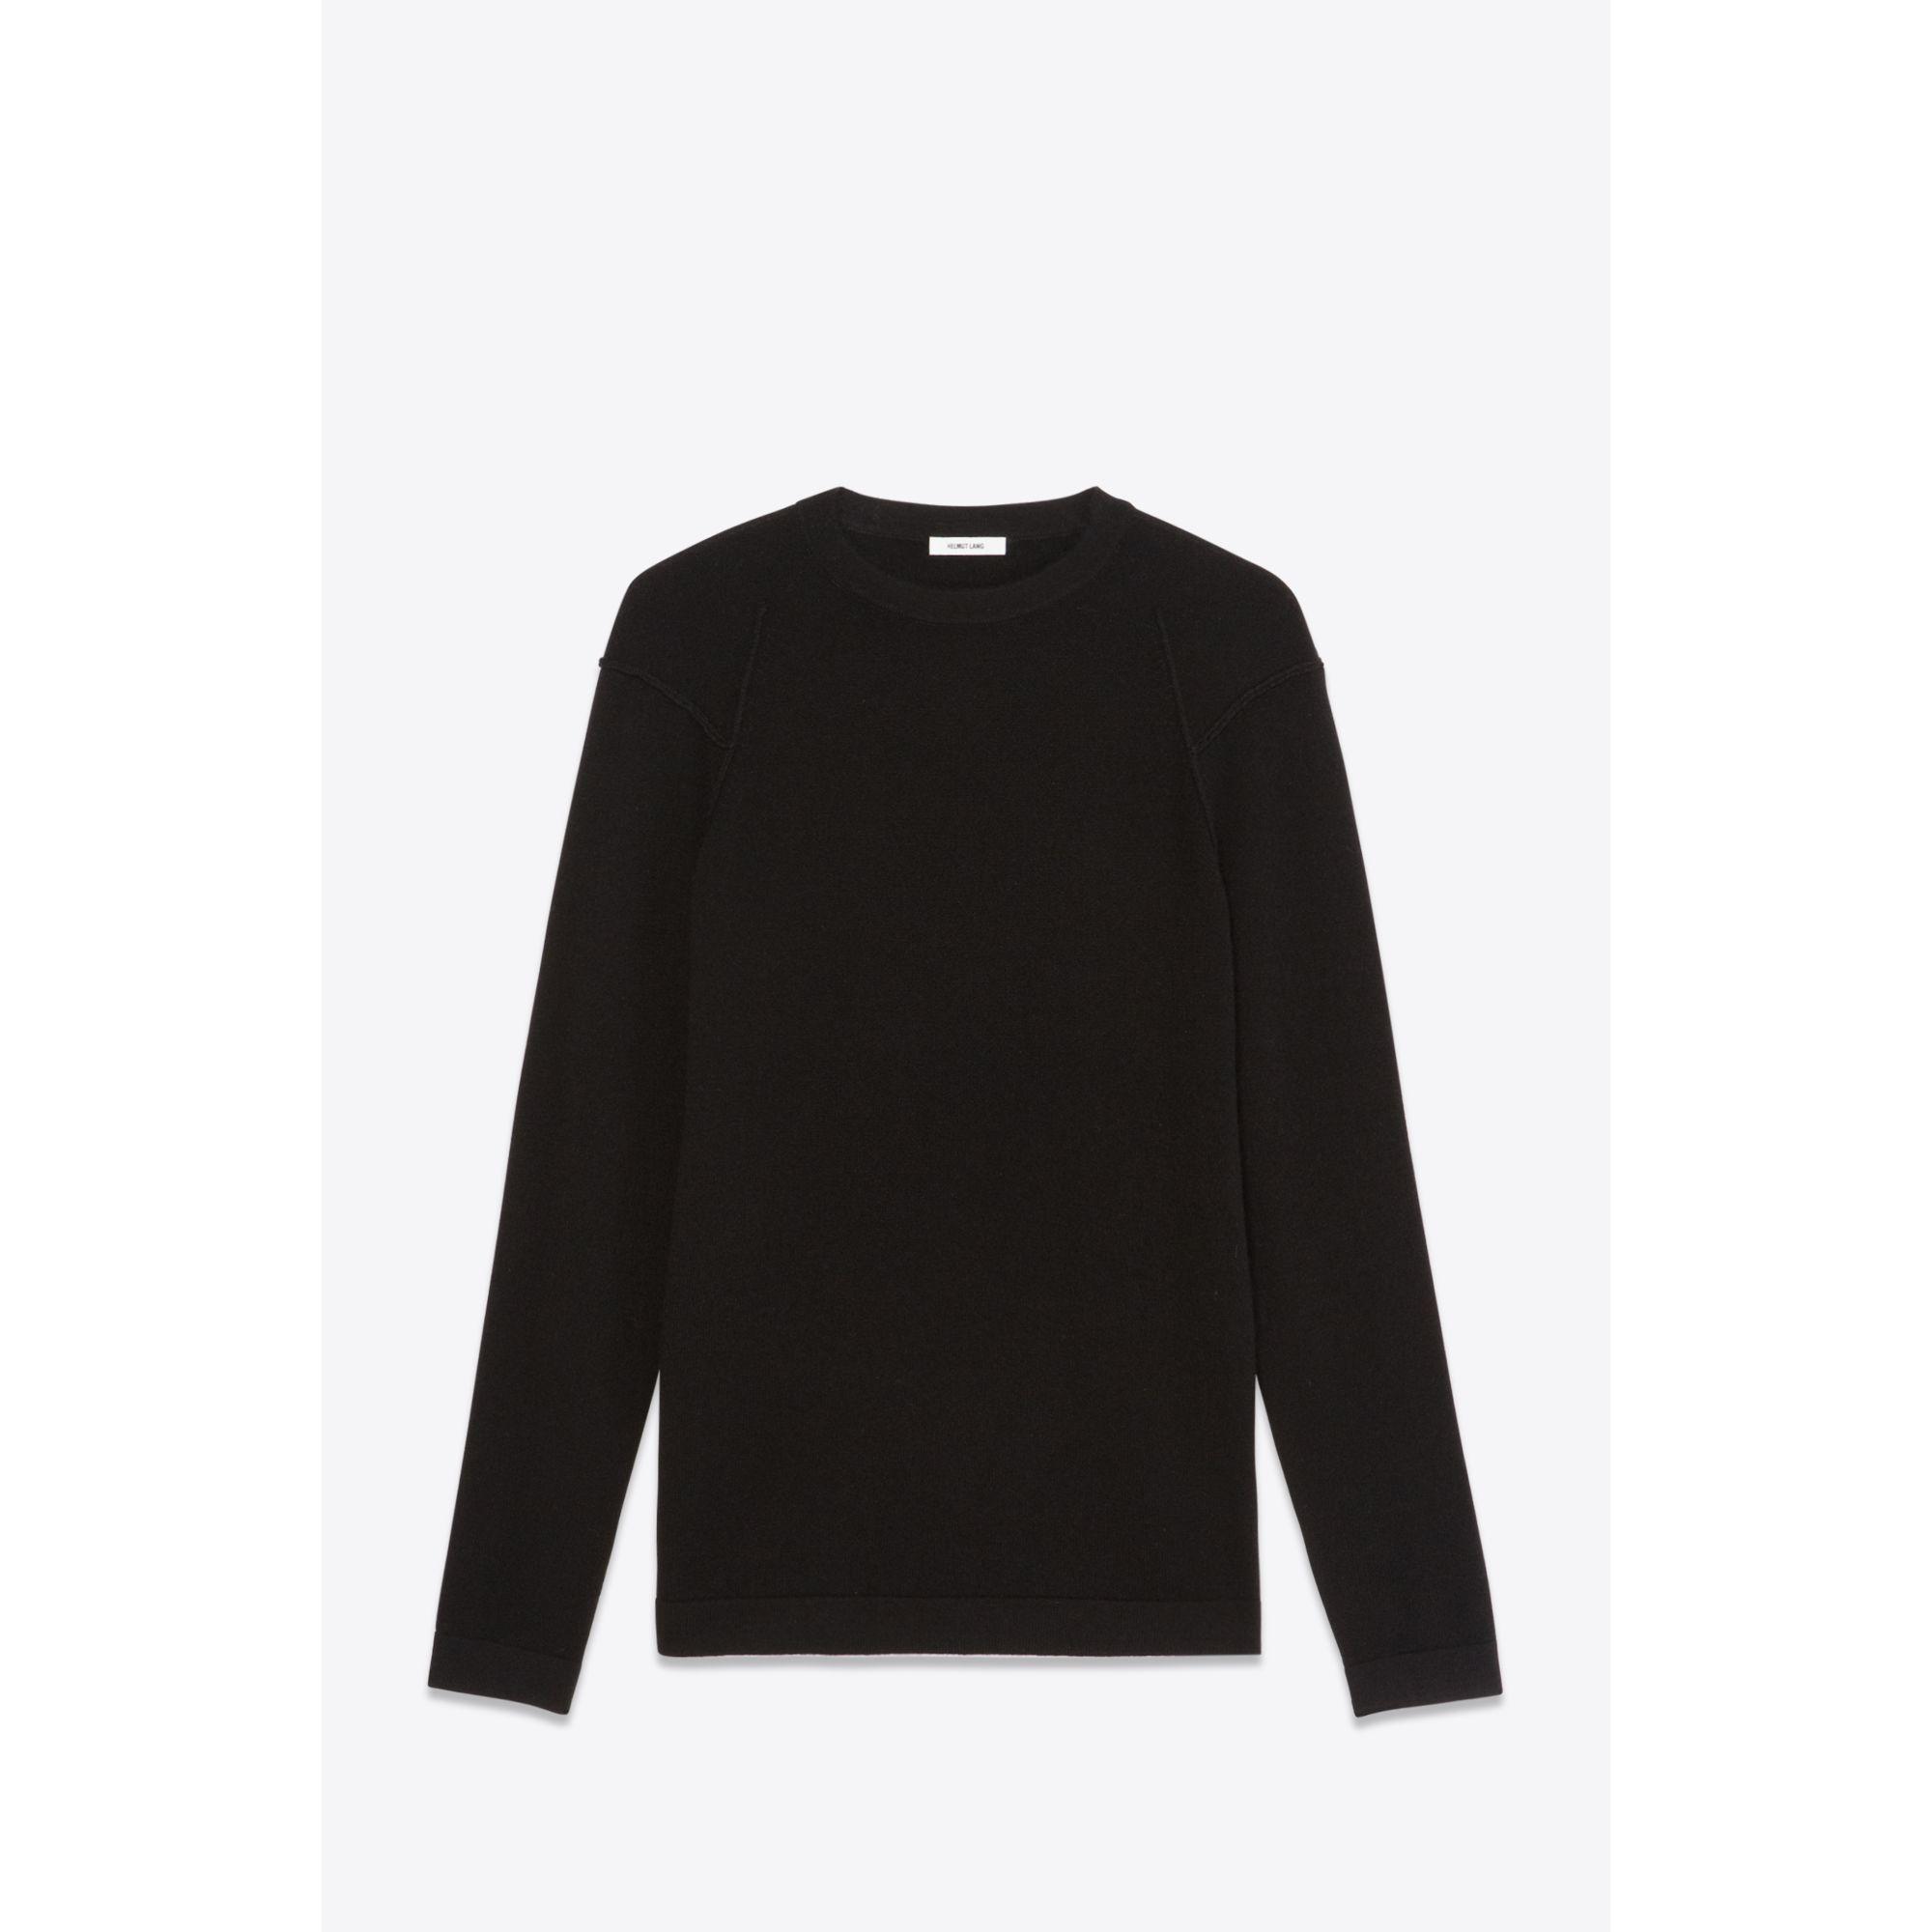 Helmut lang Cashmere Crewneck Sweater in Black for Men | Lyst